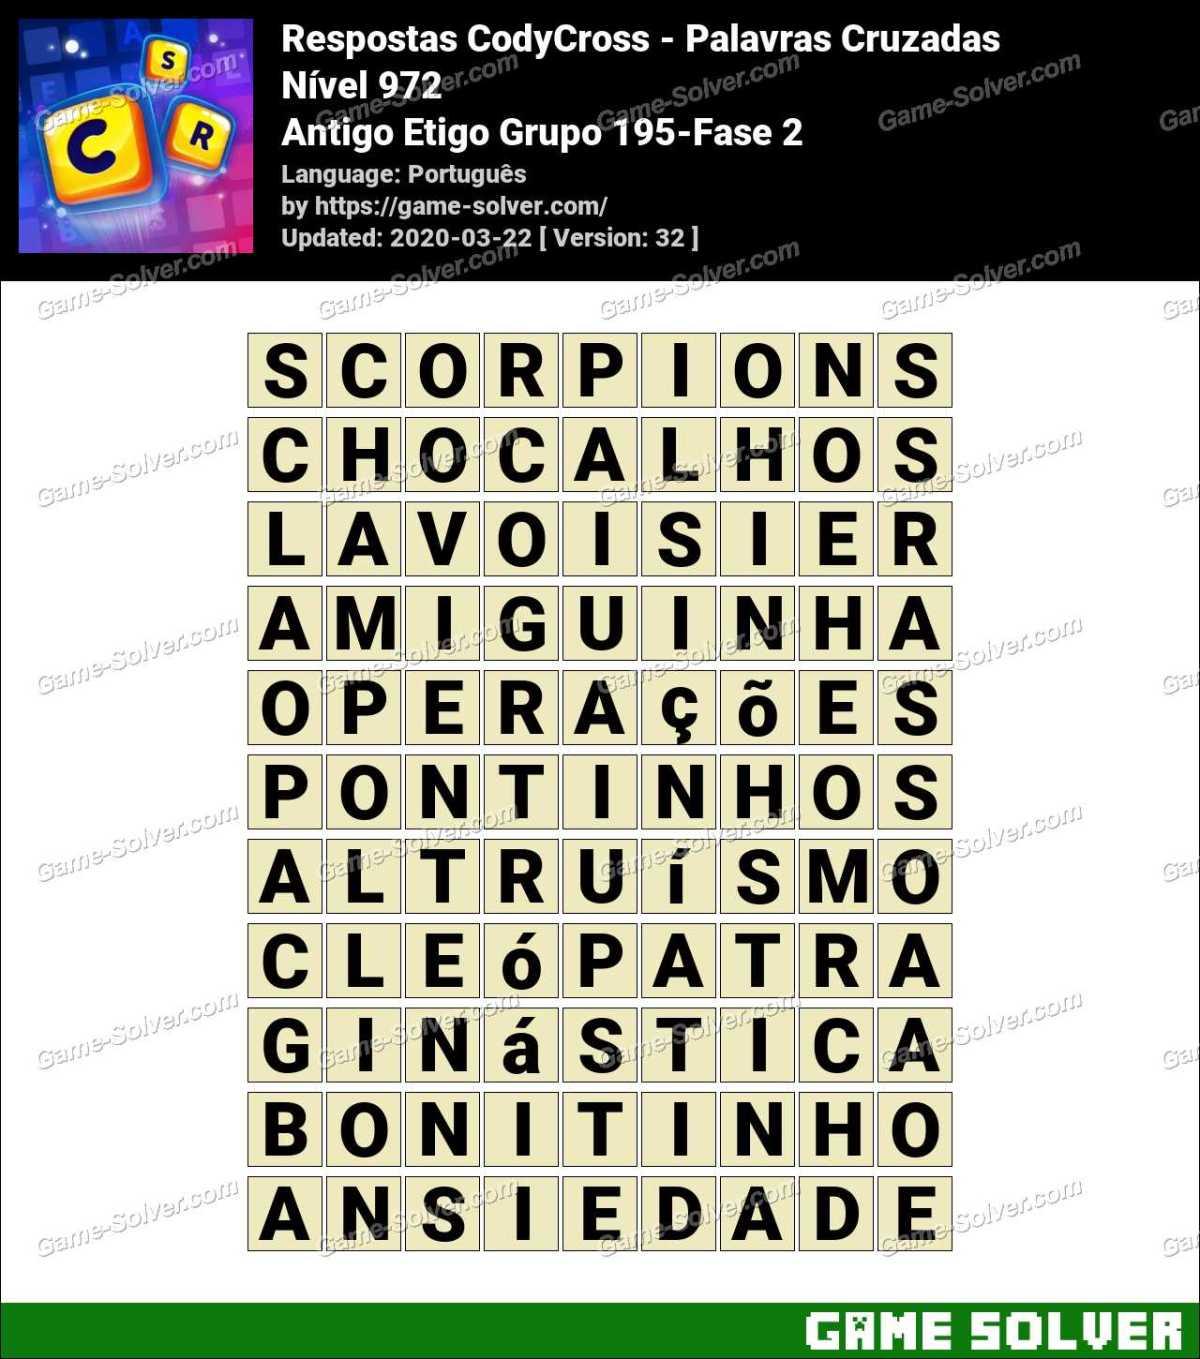 Respostas CodyCross Antigo Etigo Grupo 195-Fase 2